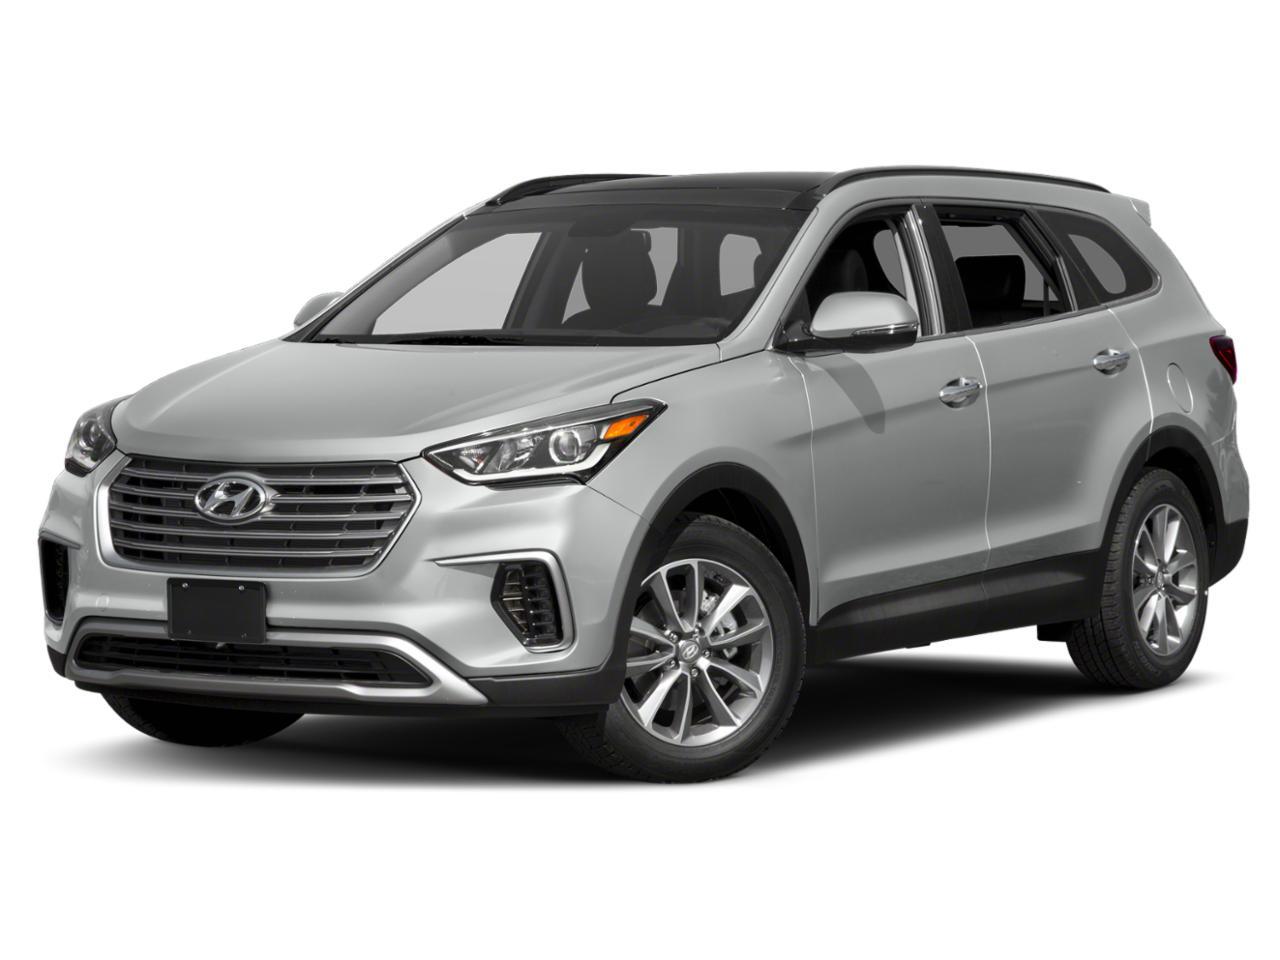 2019 Hyundai Santa Fe XL Vehicle Photo in Oshkosh, WI 54904